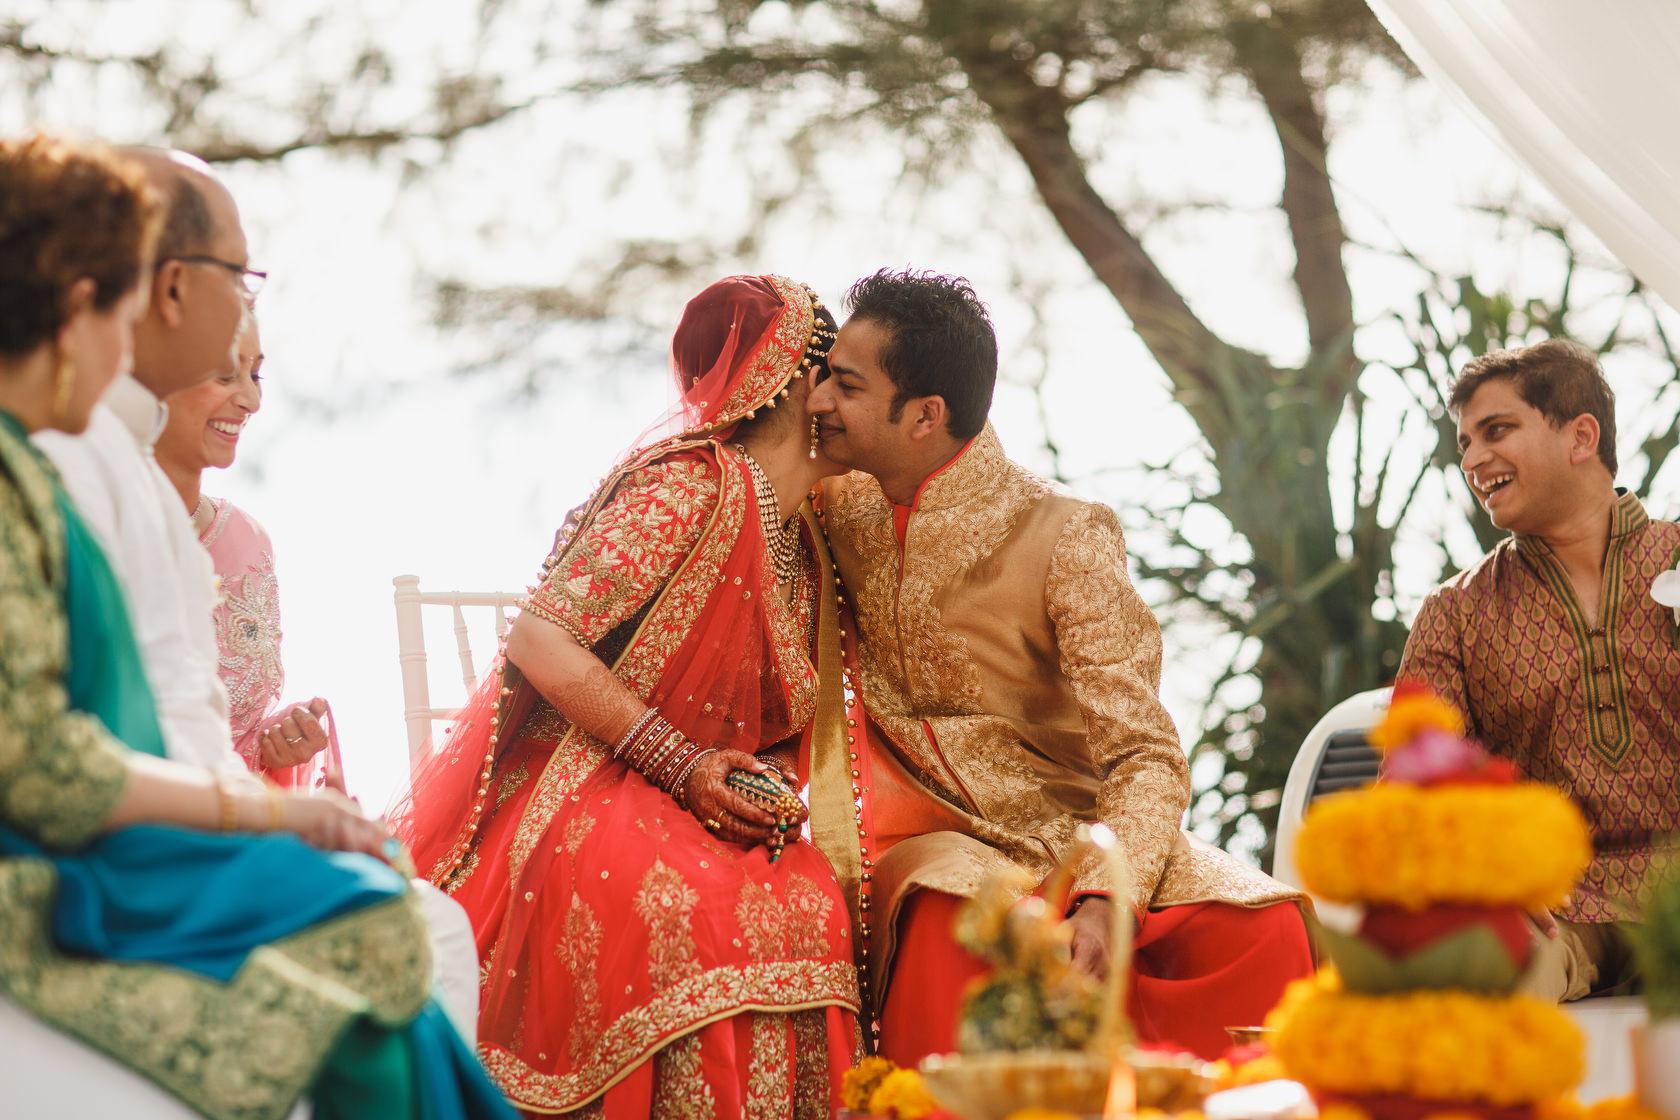 Thailand Wedding Photography: Thailand Destination Wedding Photography